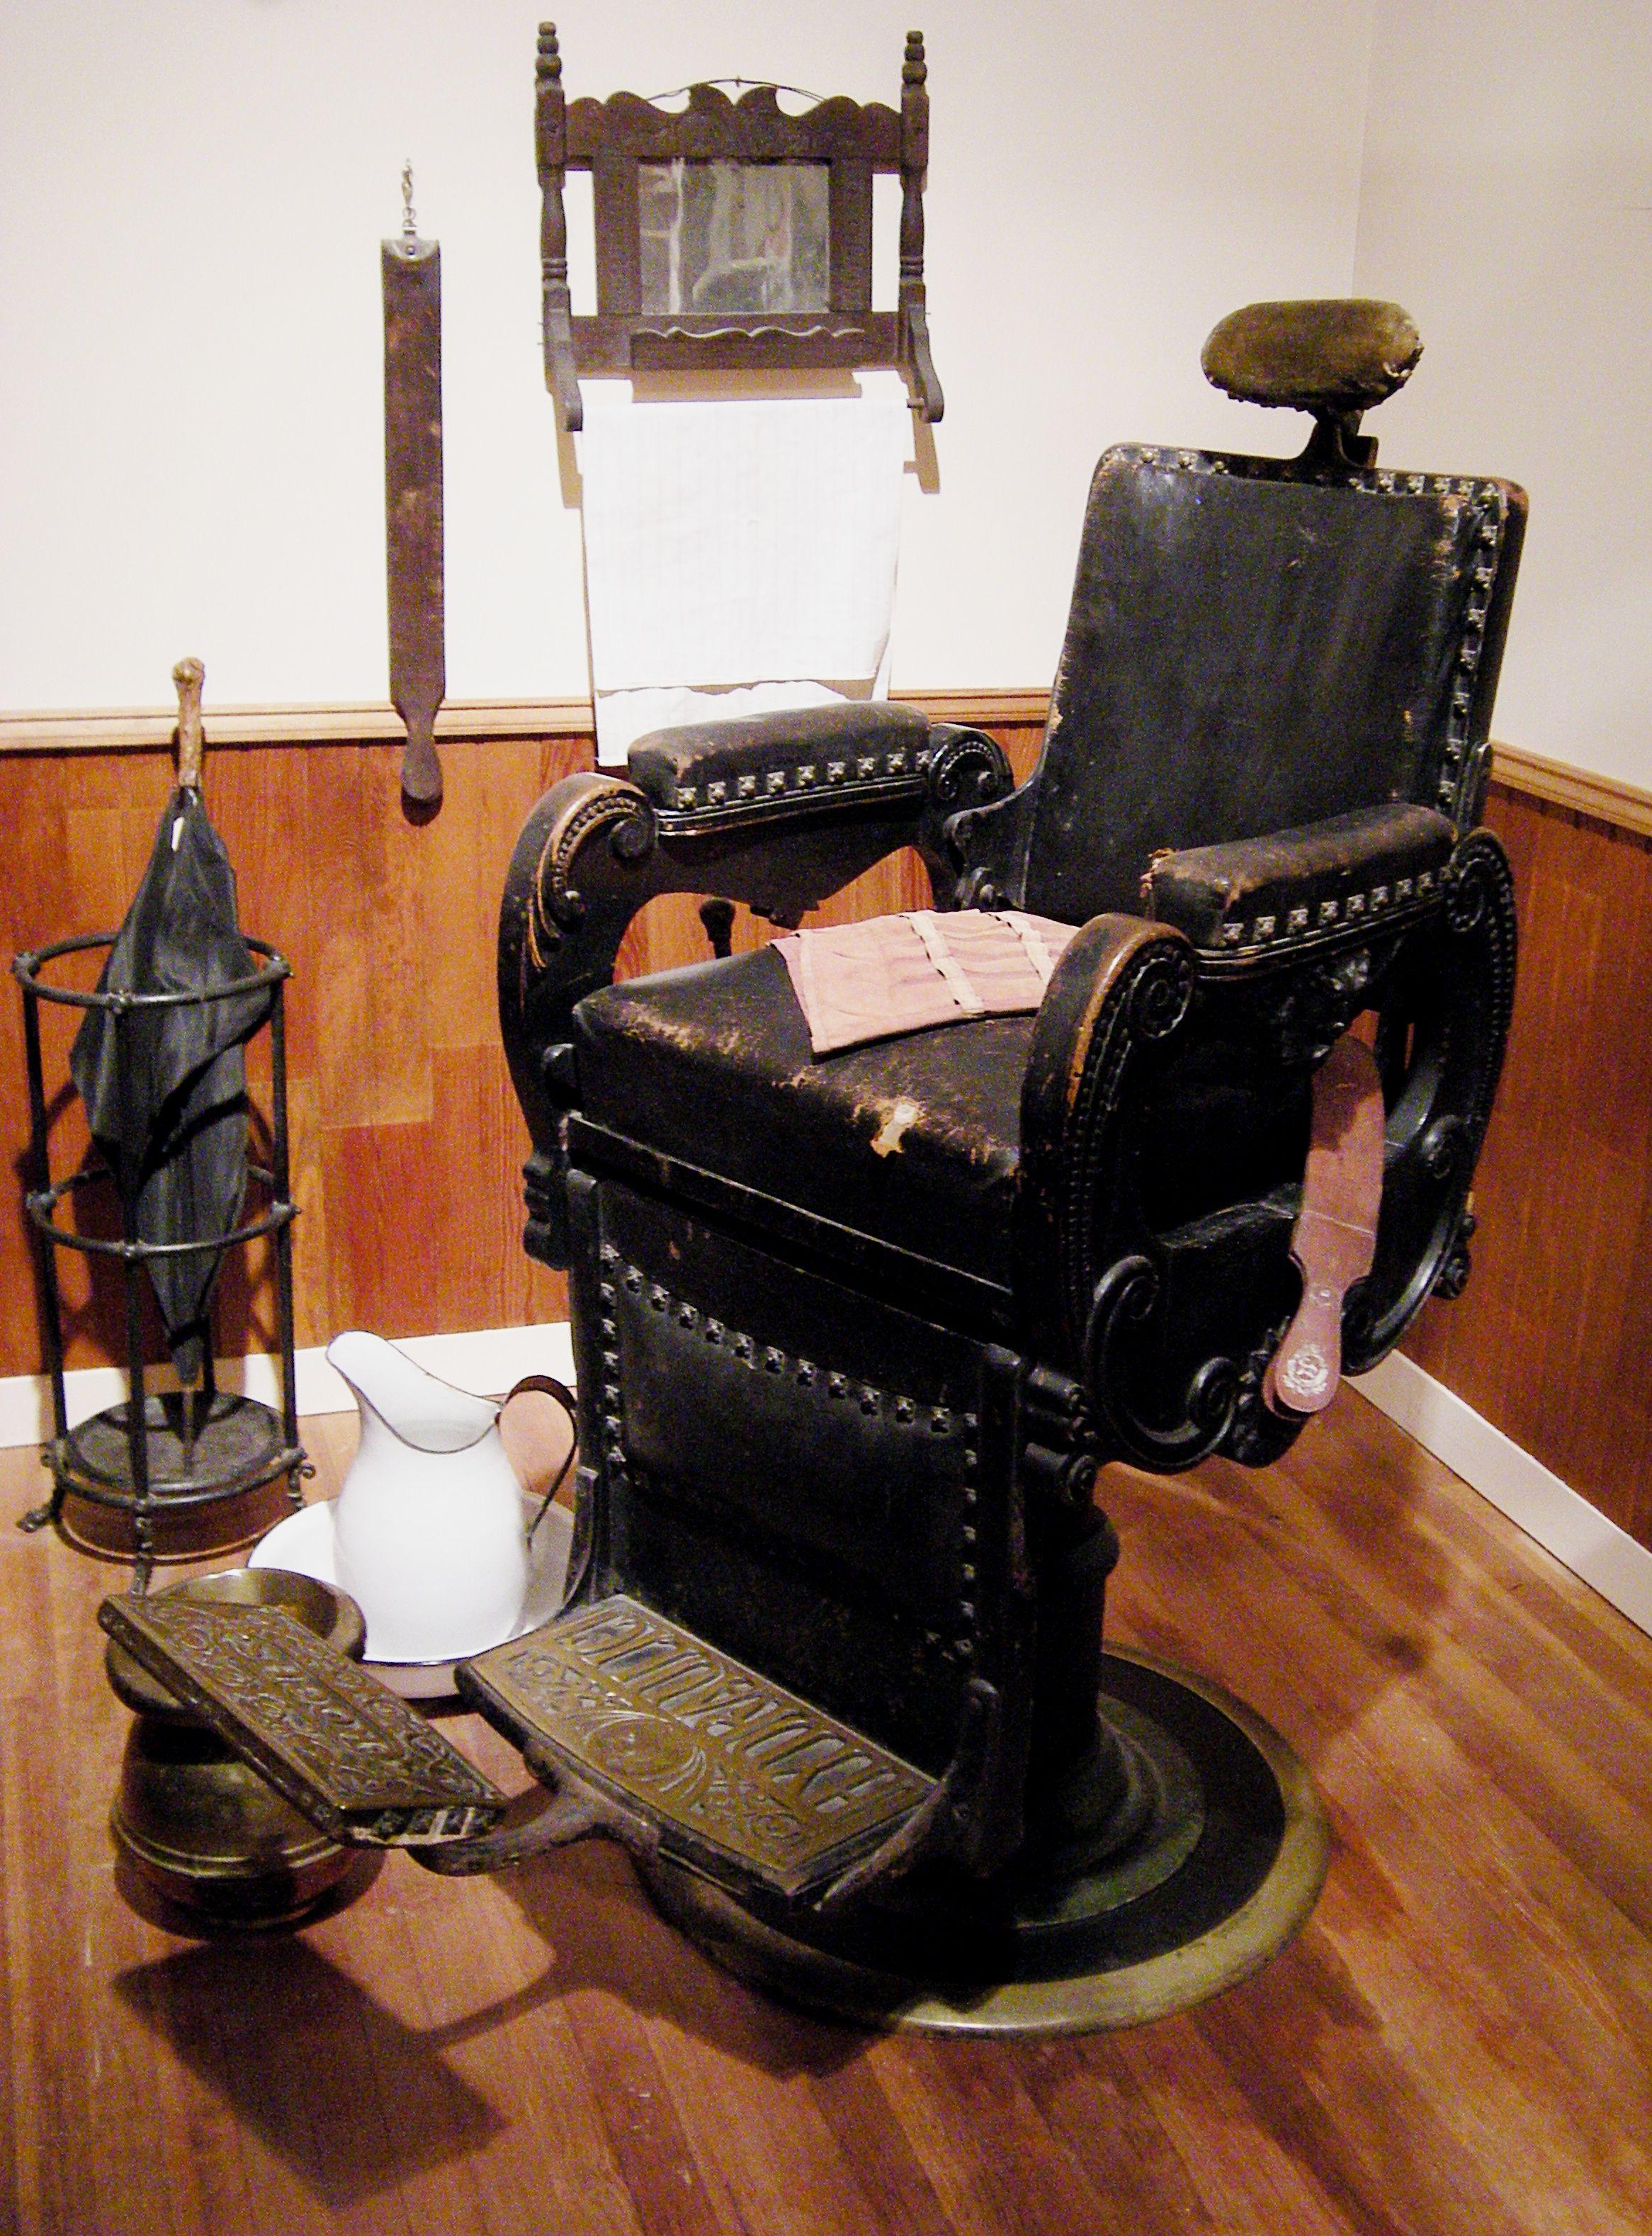 Koken 438 Barber Chair Barber Barber Chair For Sale